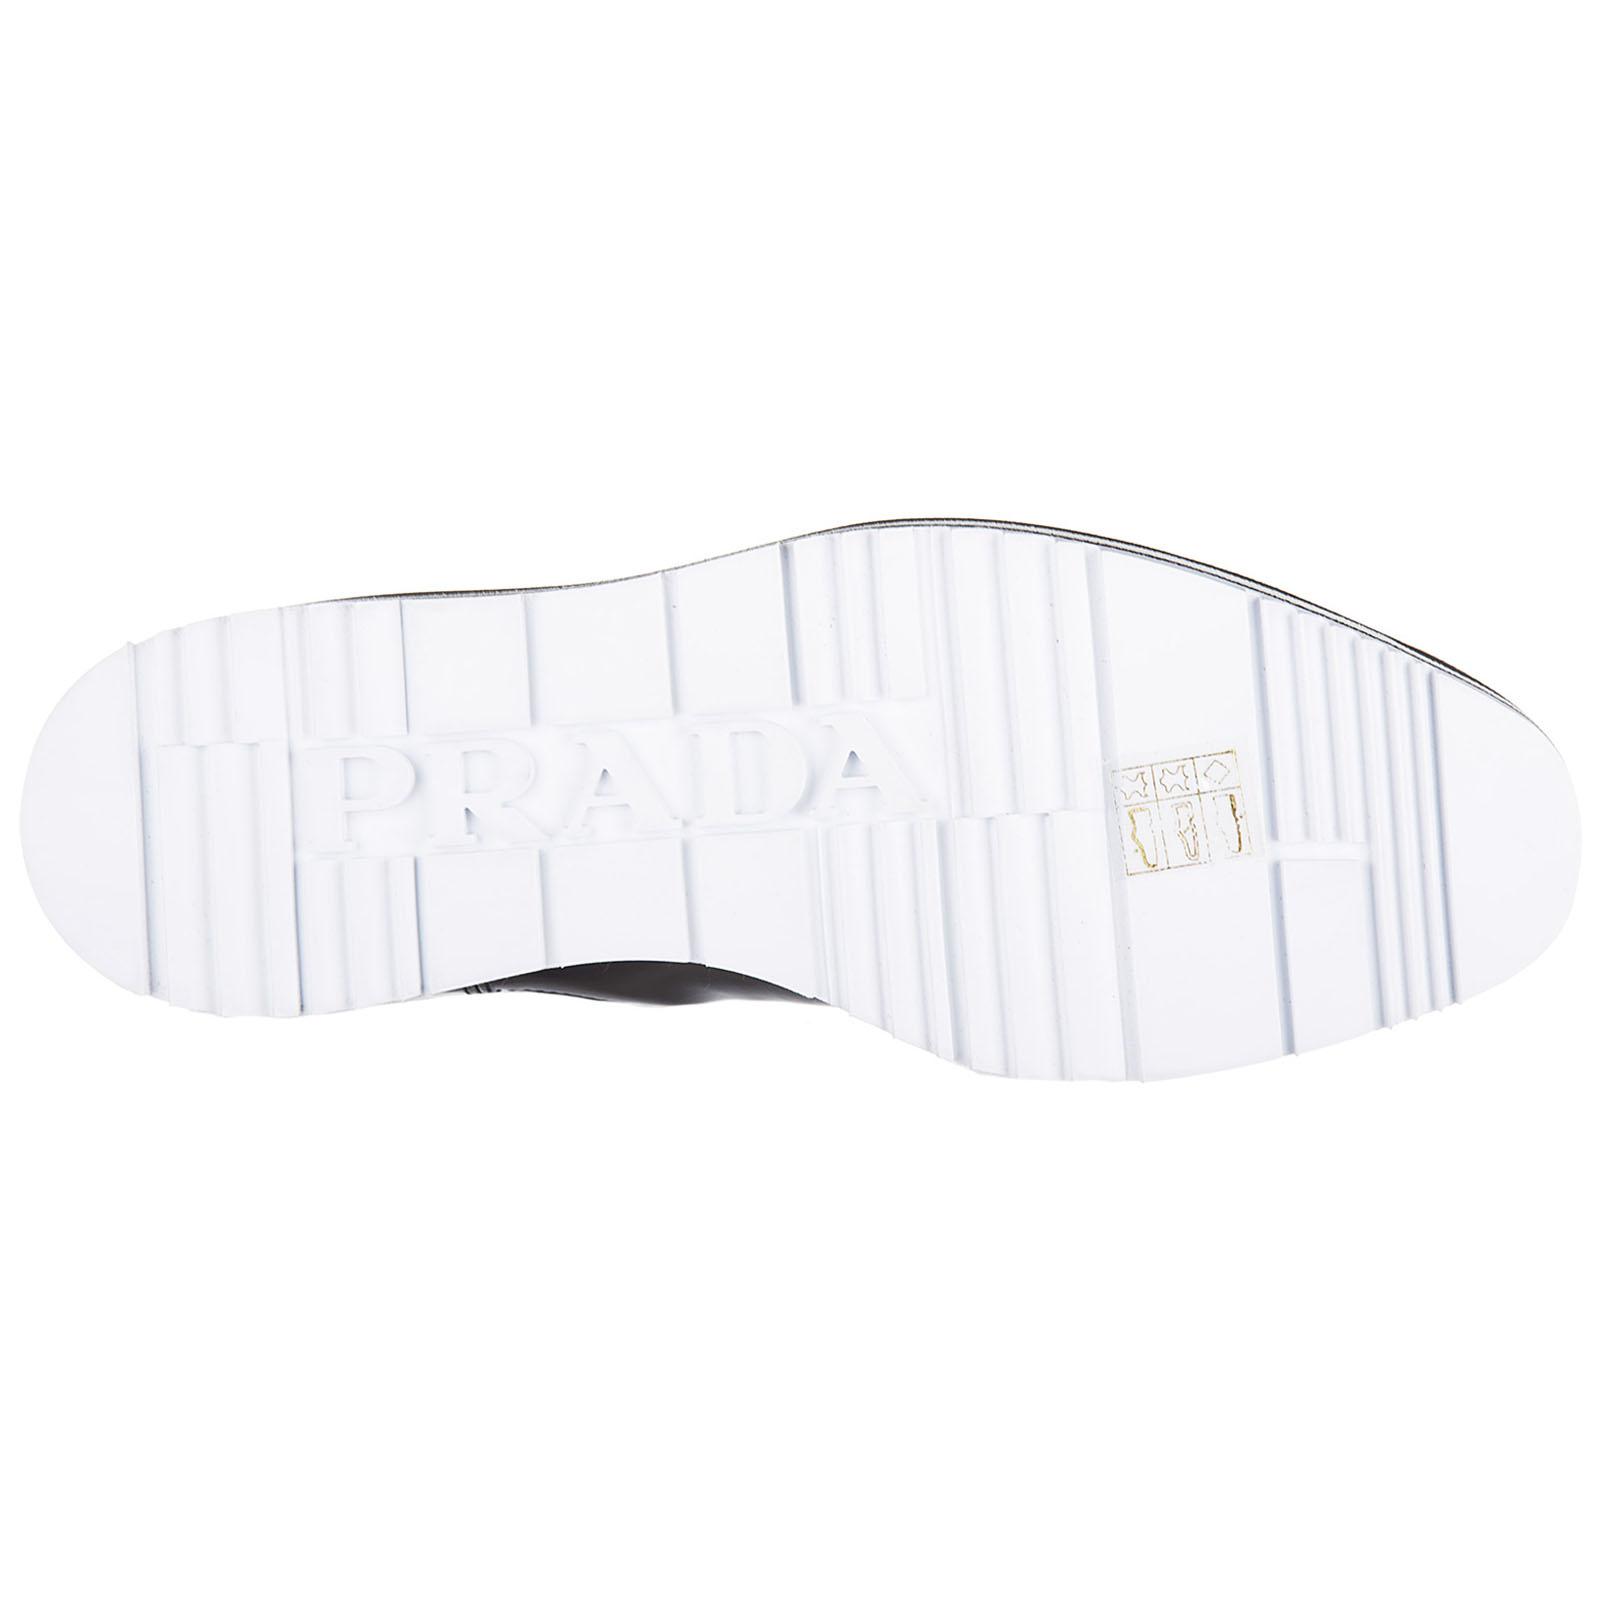 Ankle Boots Prada 1t096h 055 F Nero